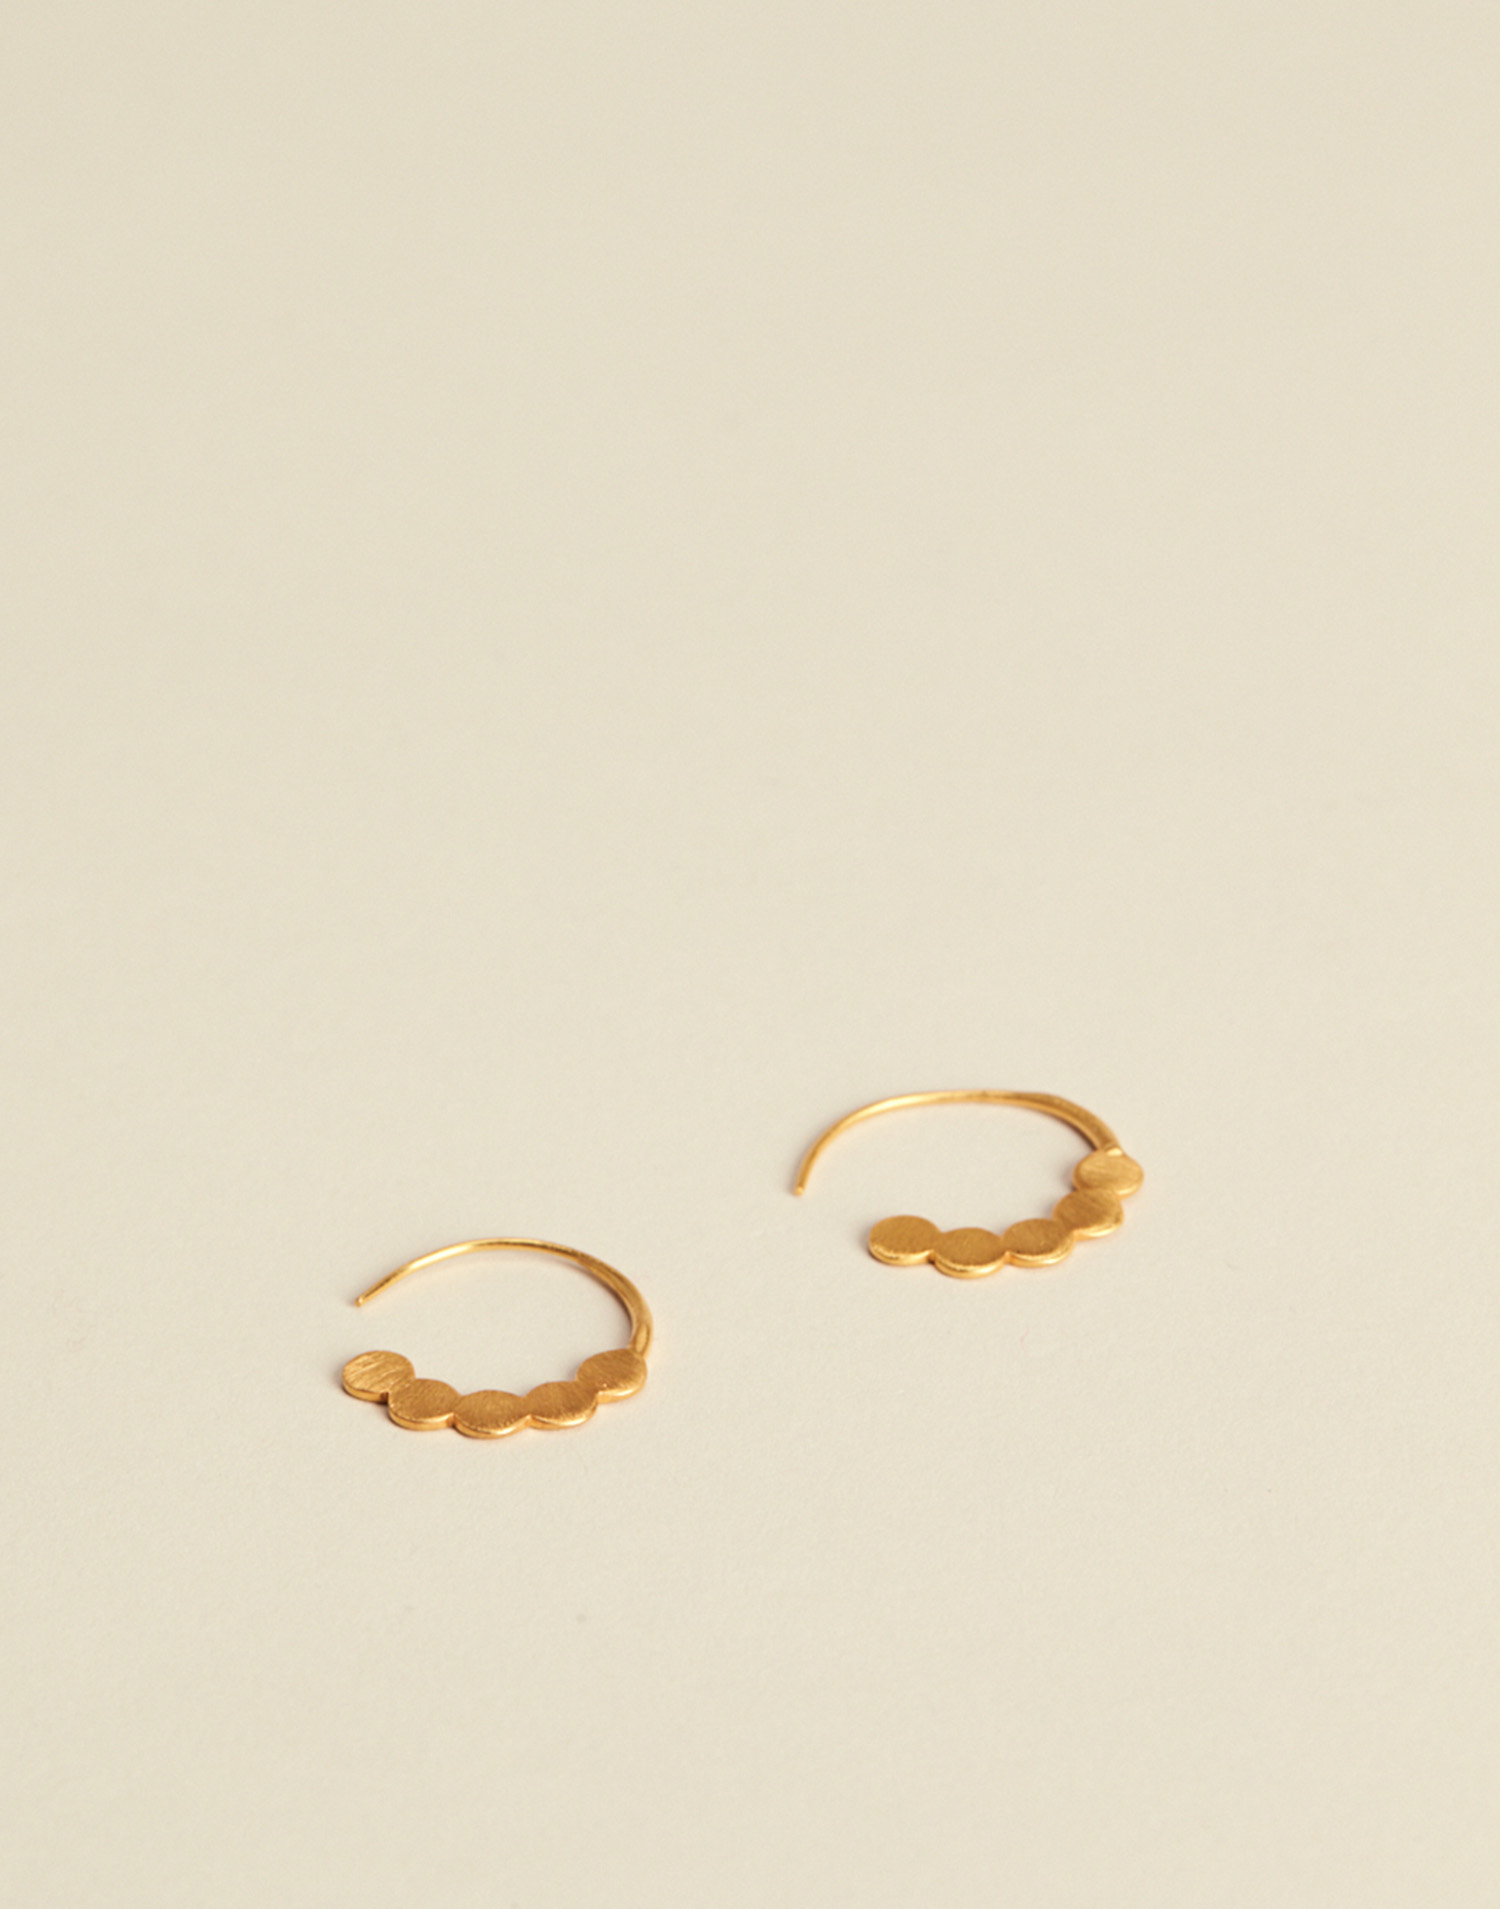 GOLD PLATED HOOP EARRING